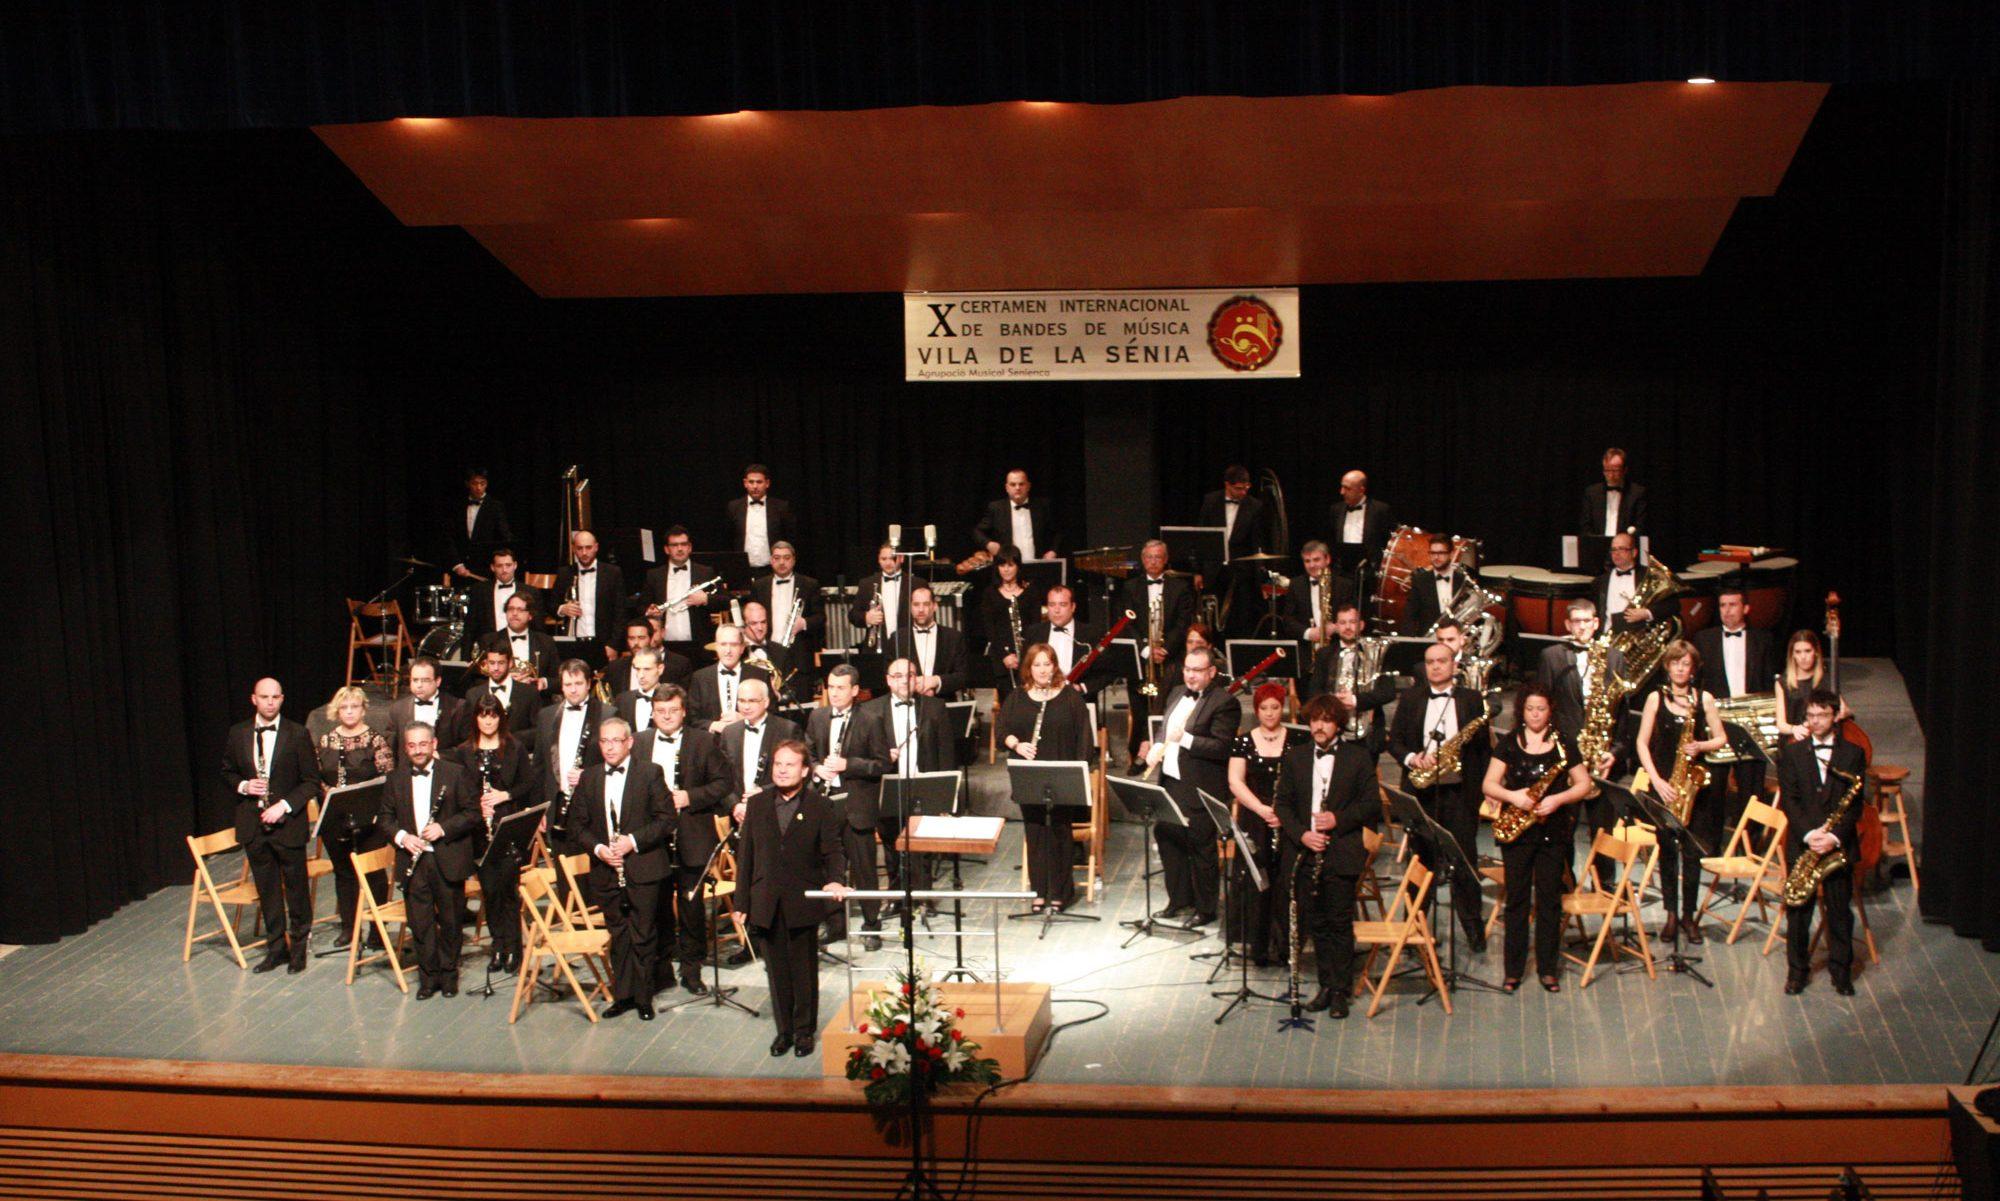 Certamen Internacional de Bandas de Música Vila de la Sénia